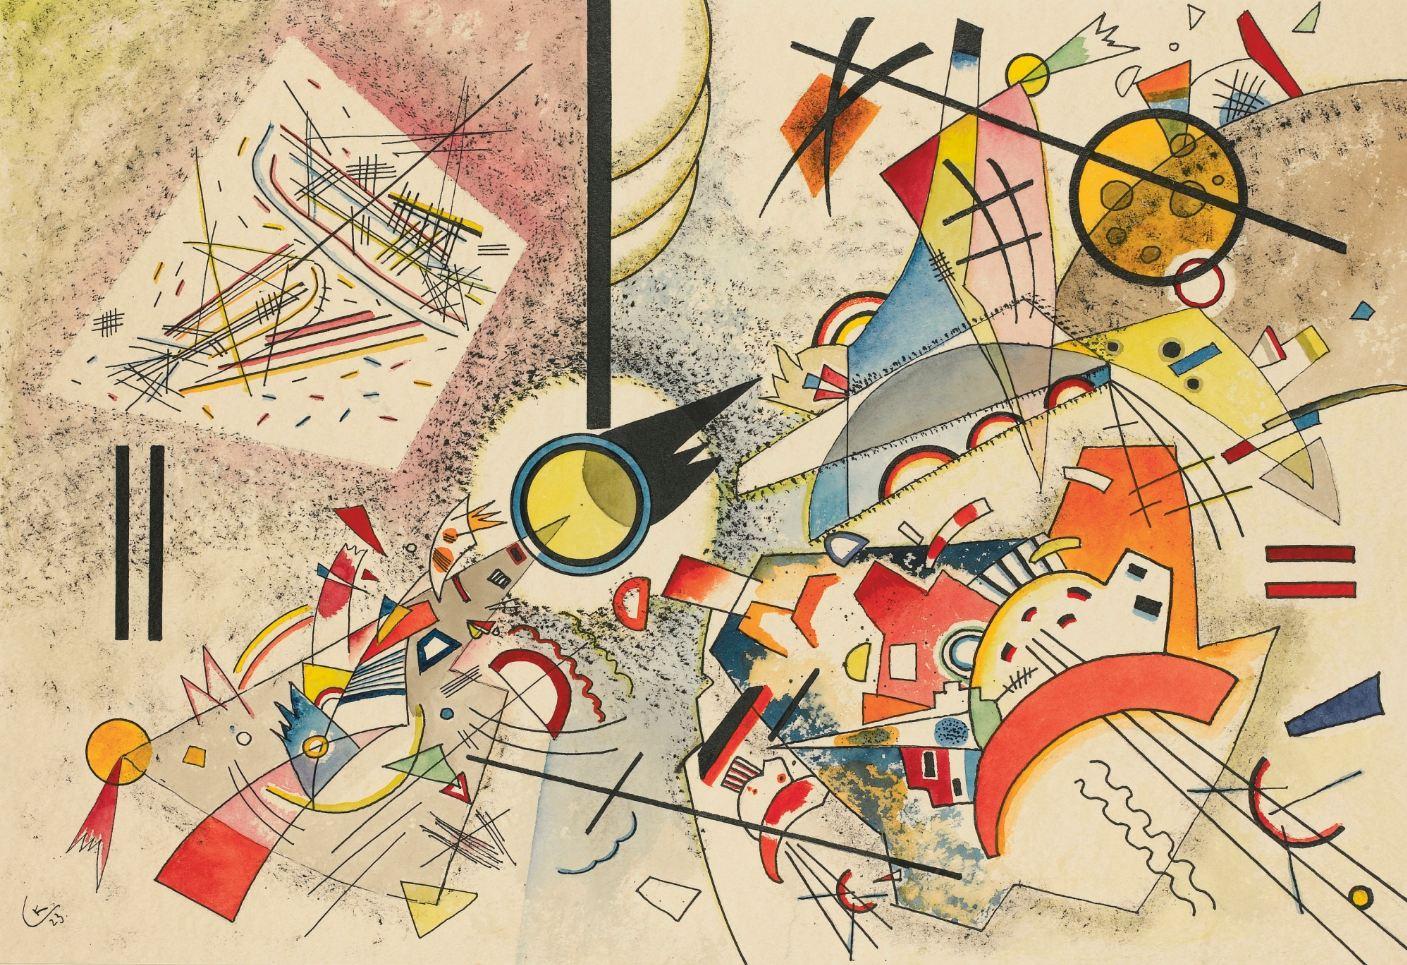 Untitled (1923) by Wassily Kandinsky